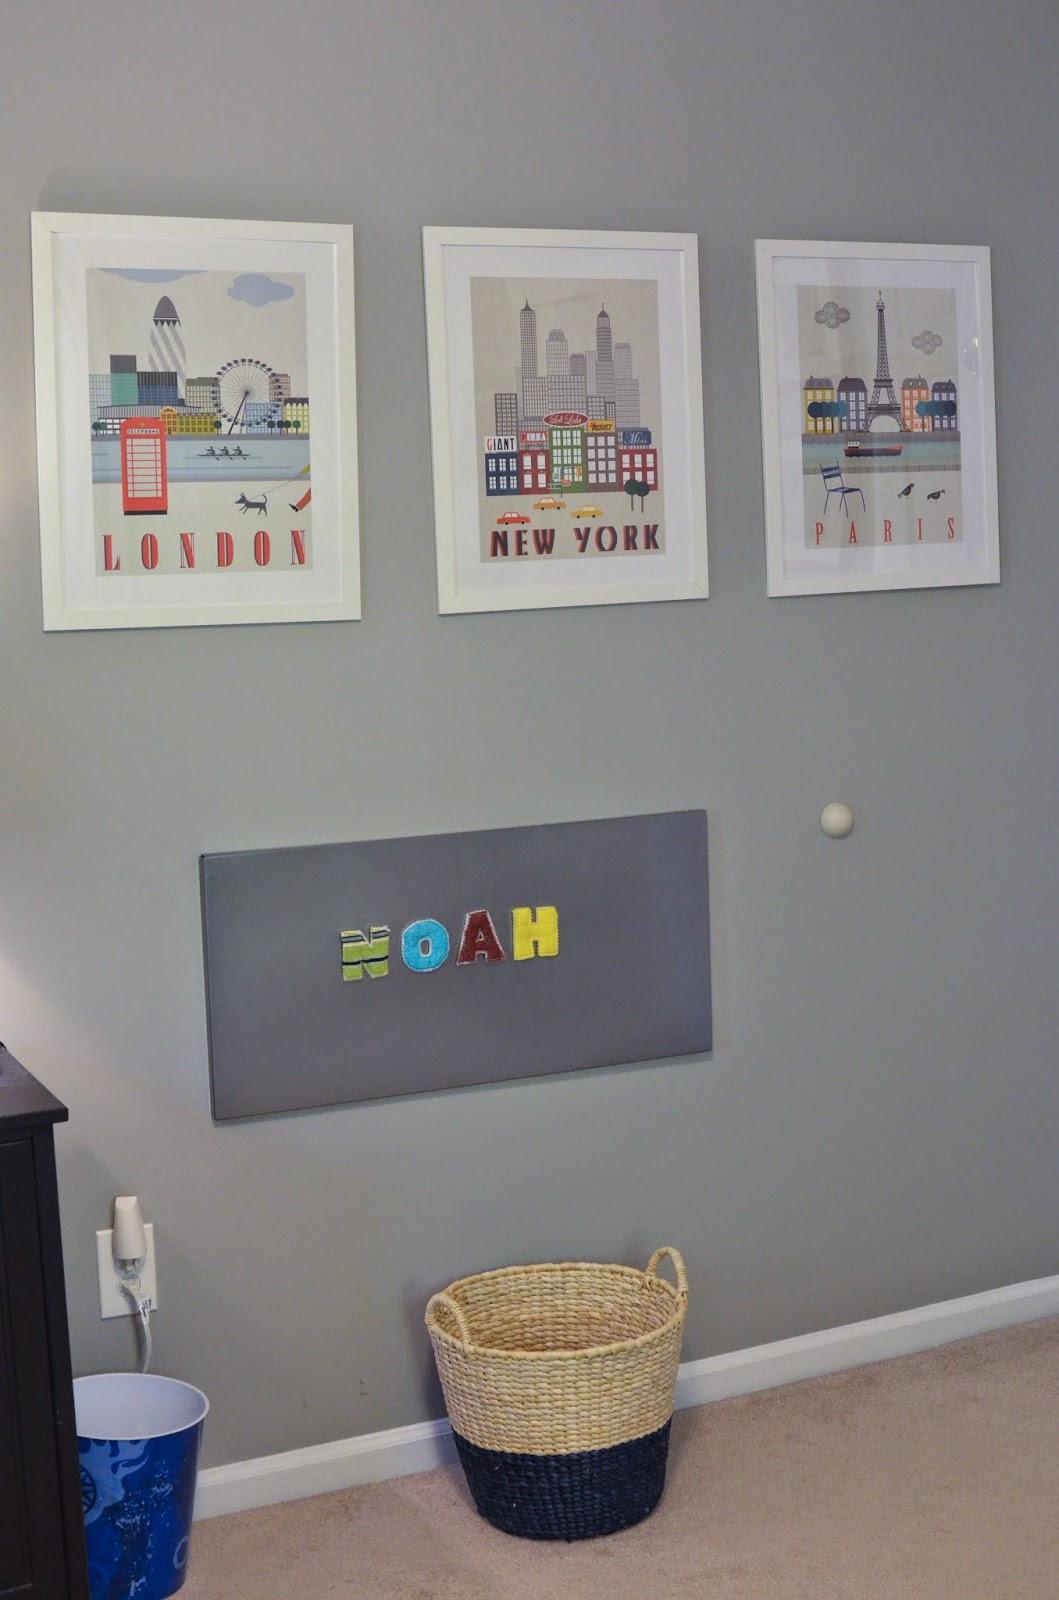 ikea paris picture top decoration salon deco ikea paris. Black Bedroom Furniture Sets. Home Design Ideas